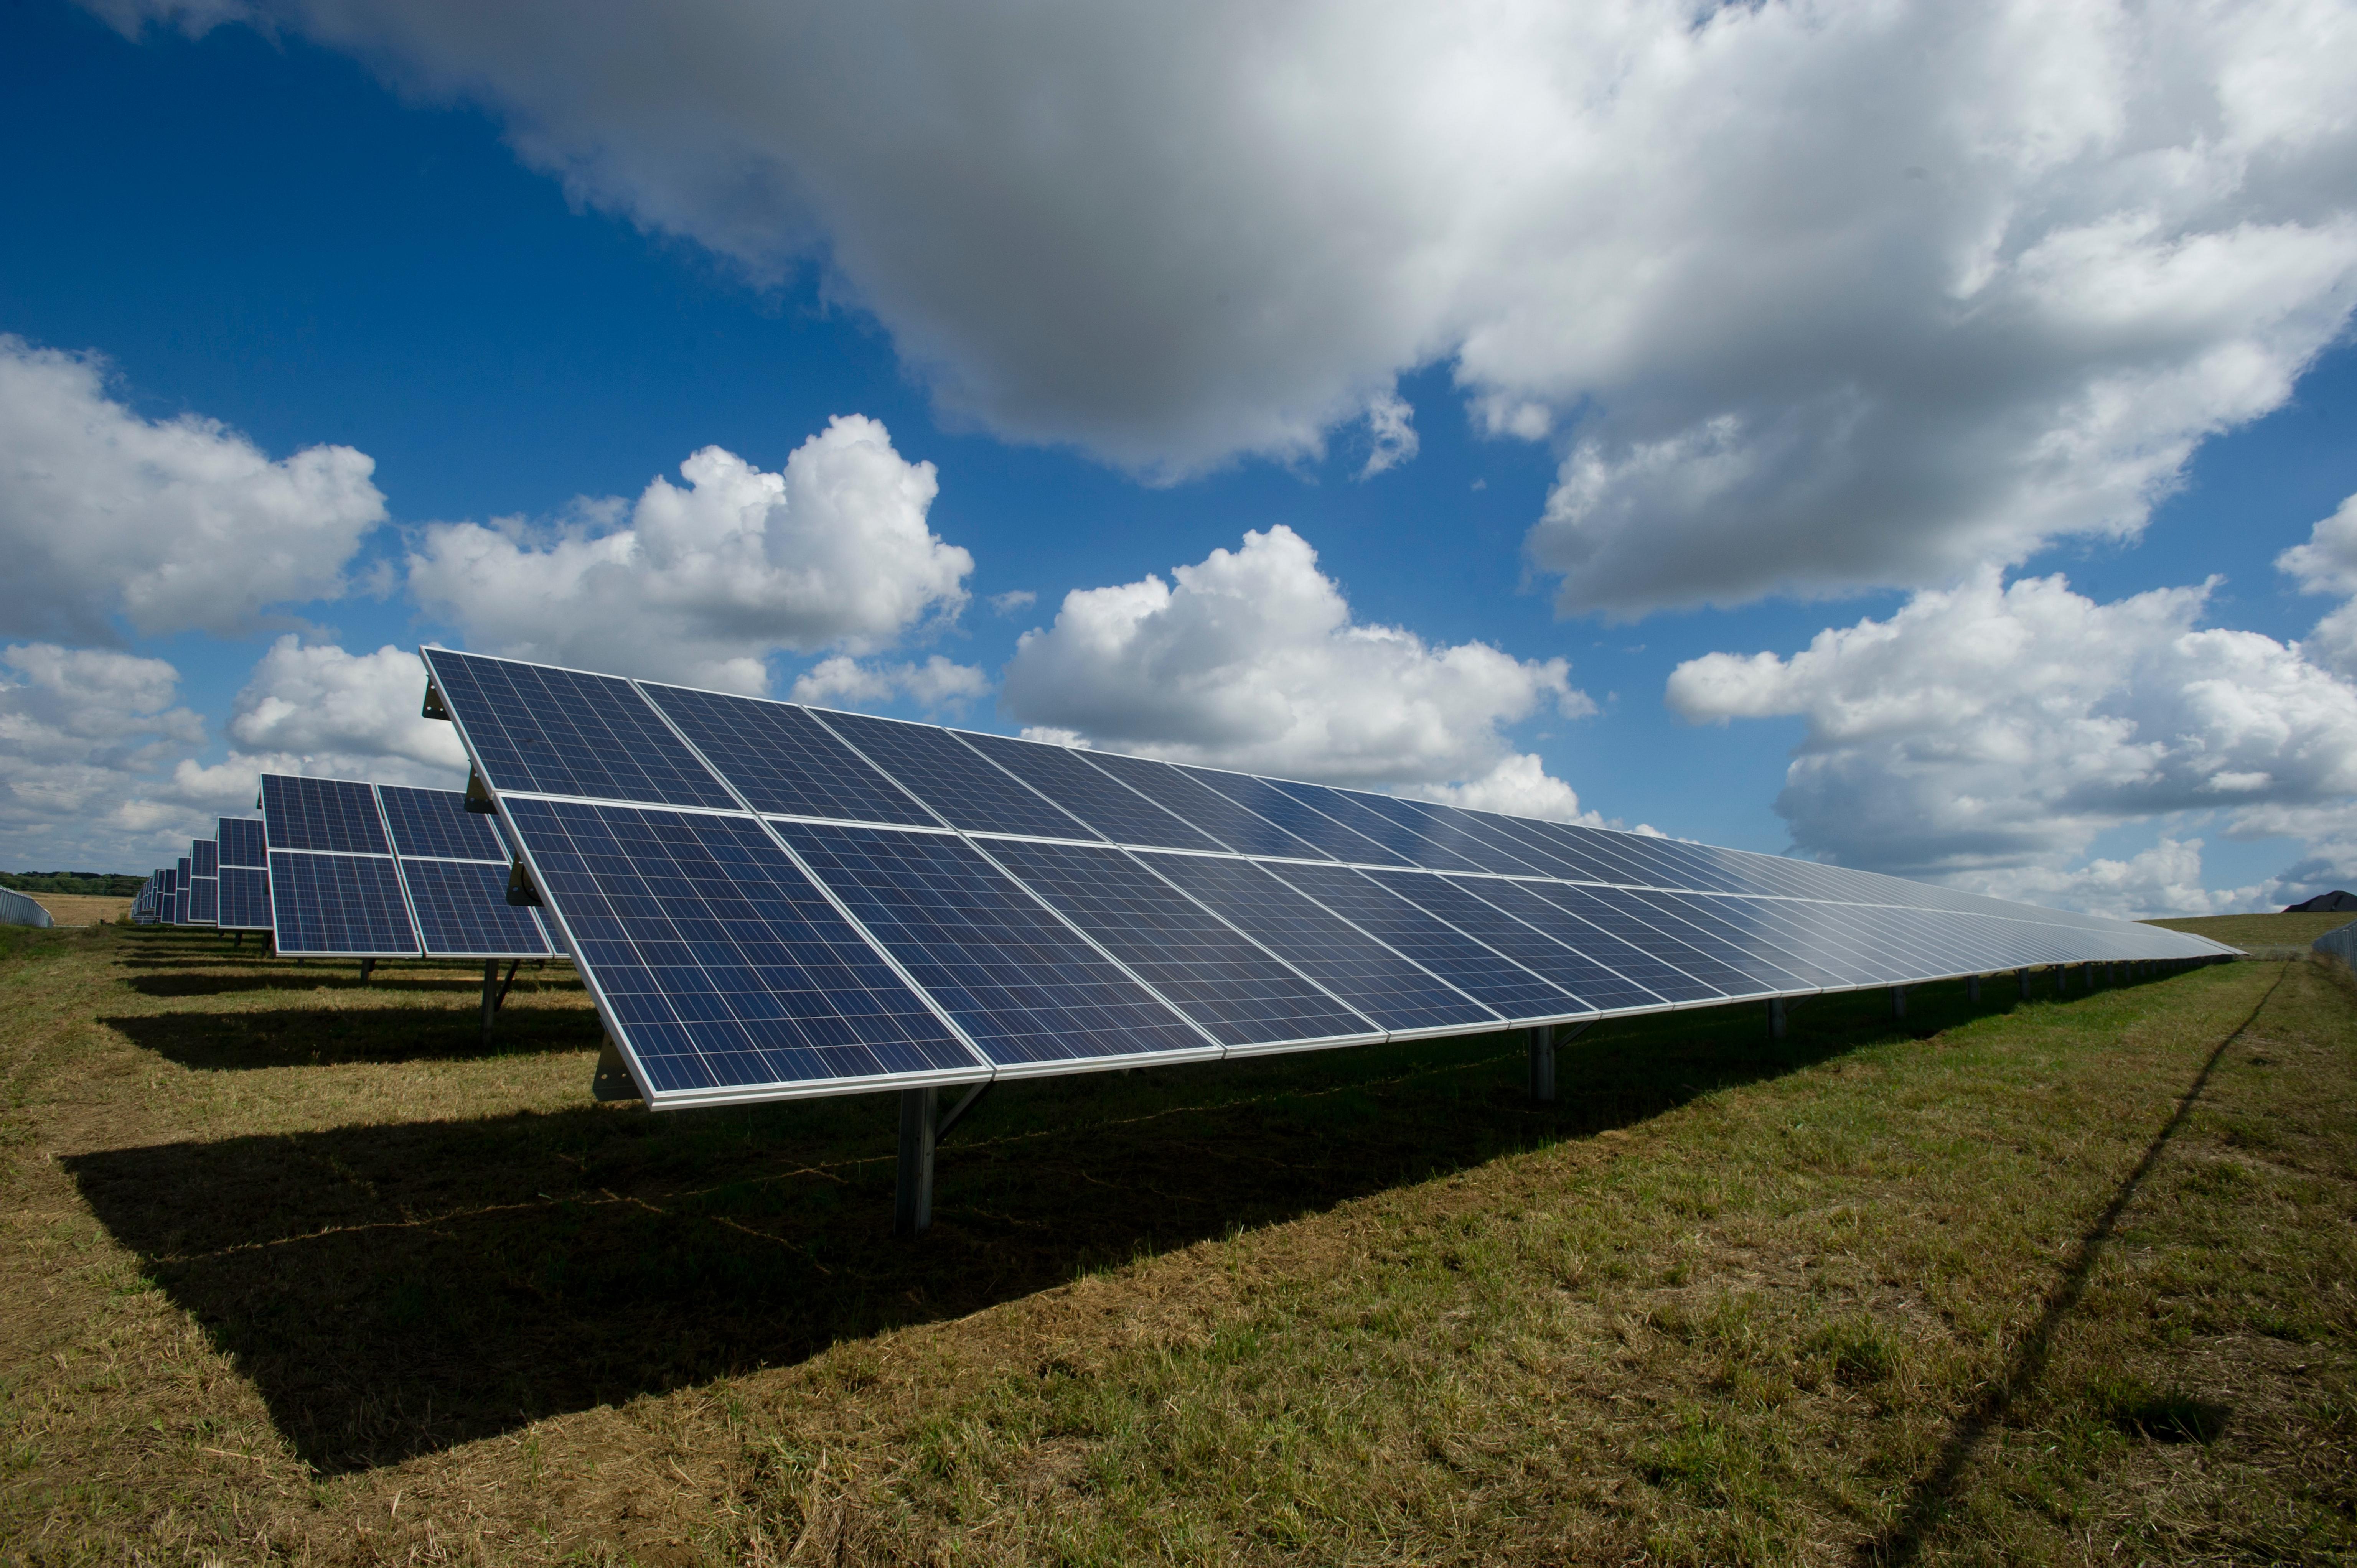 Huge filed of solar panels generating alternative energy